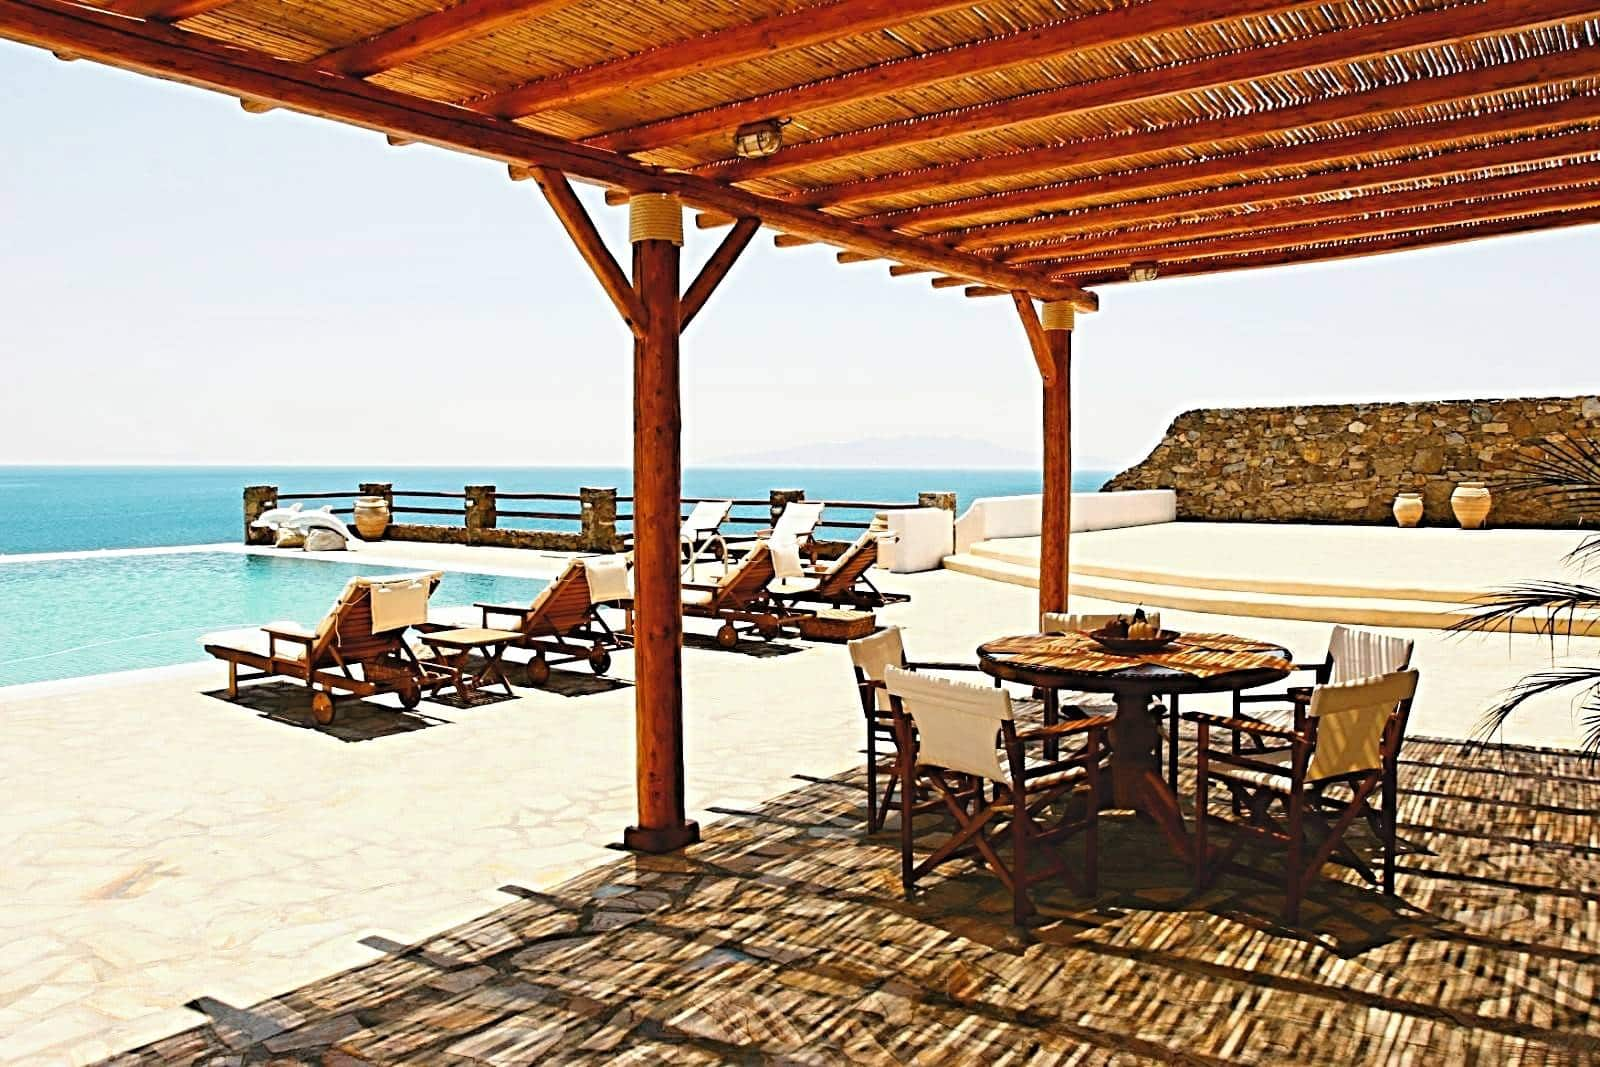 luxurious villa Mykonos - πολυτελής βίλα Μύκονος - mykonos services - οικοδομικές εργασίες 21